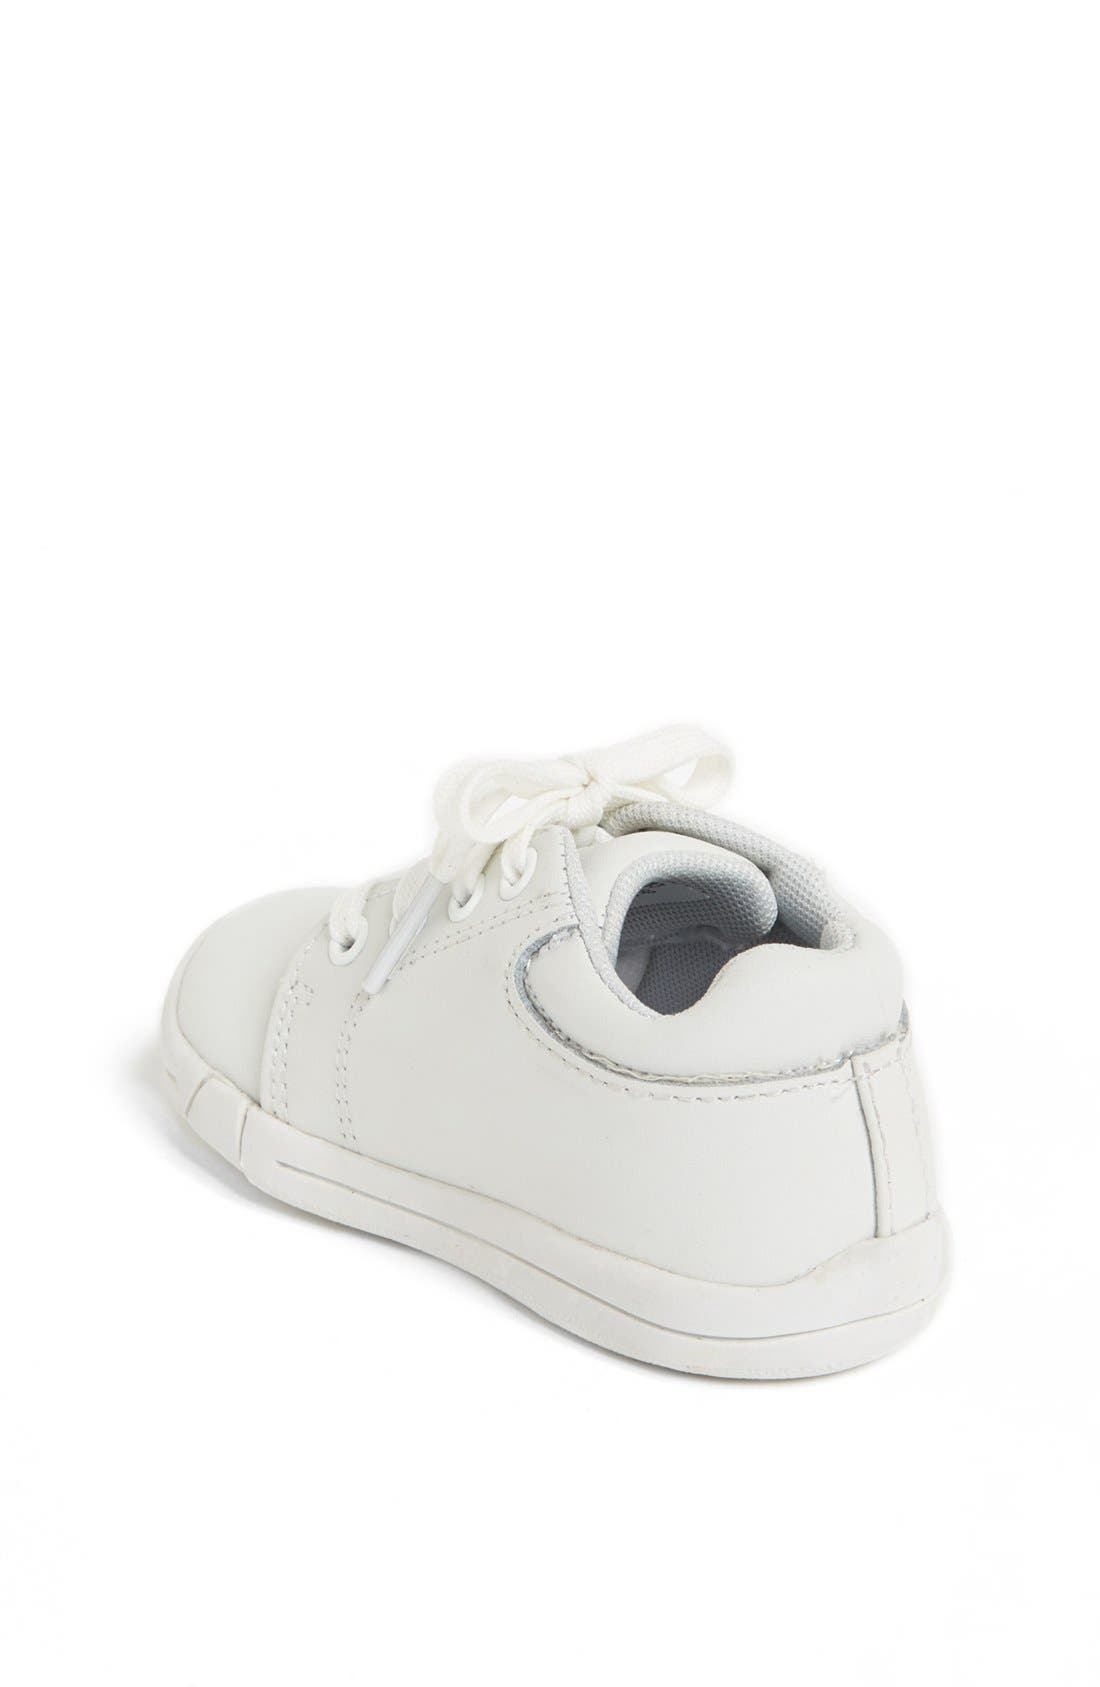 Alternate Image 2  - Jumping Jacks 'Perfection' Sneaker (Baby, Walker & Toddler)